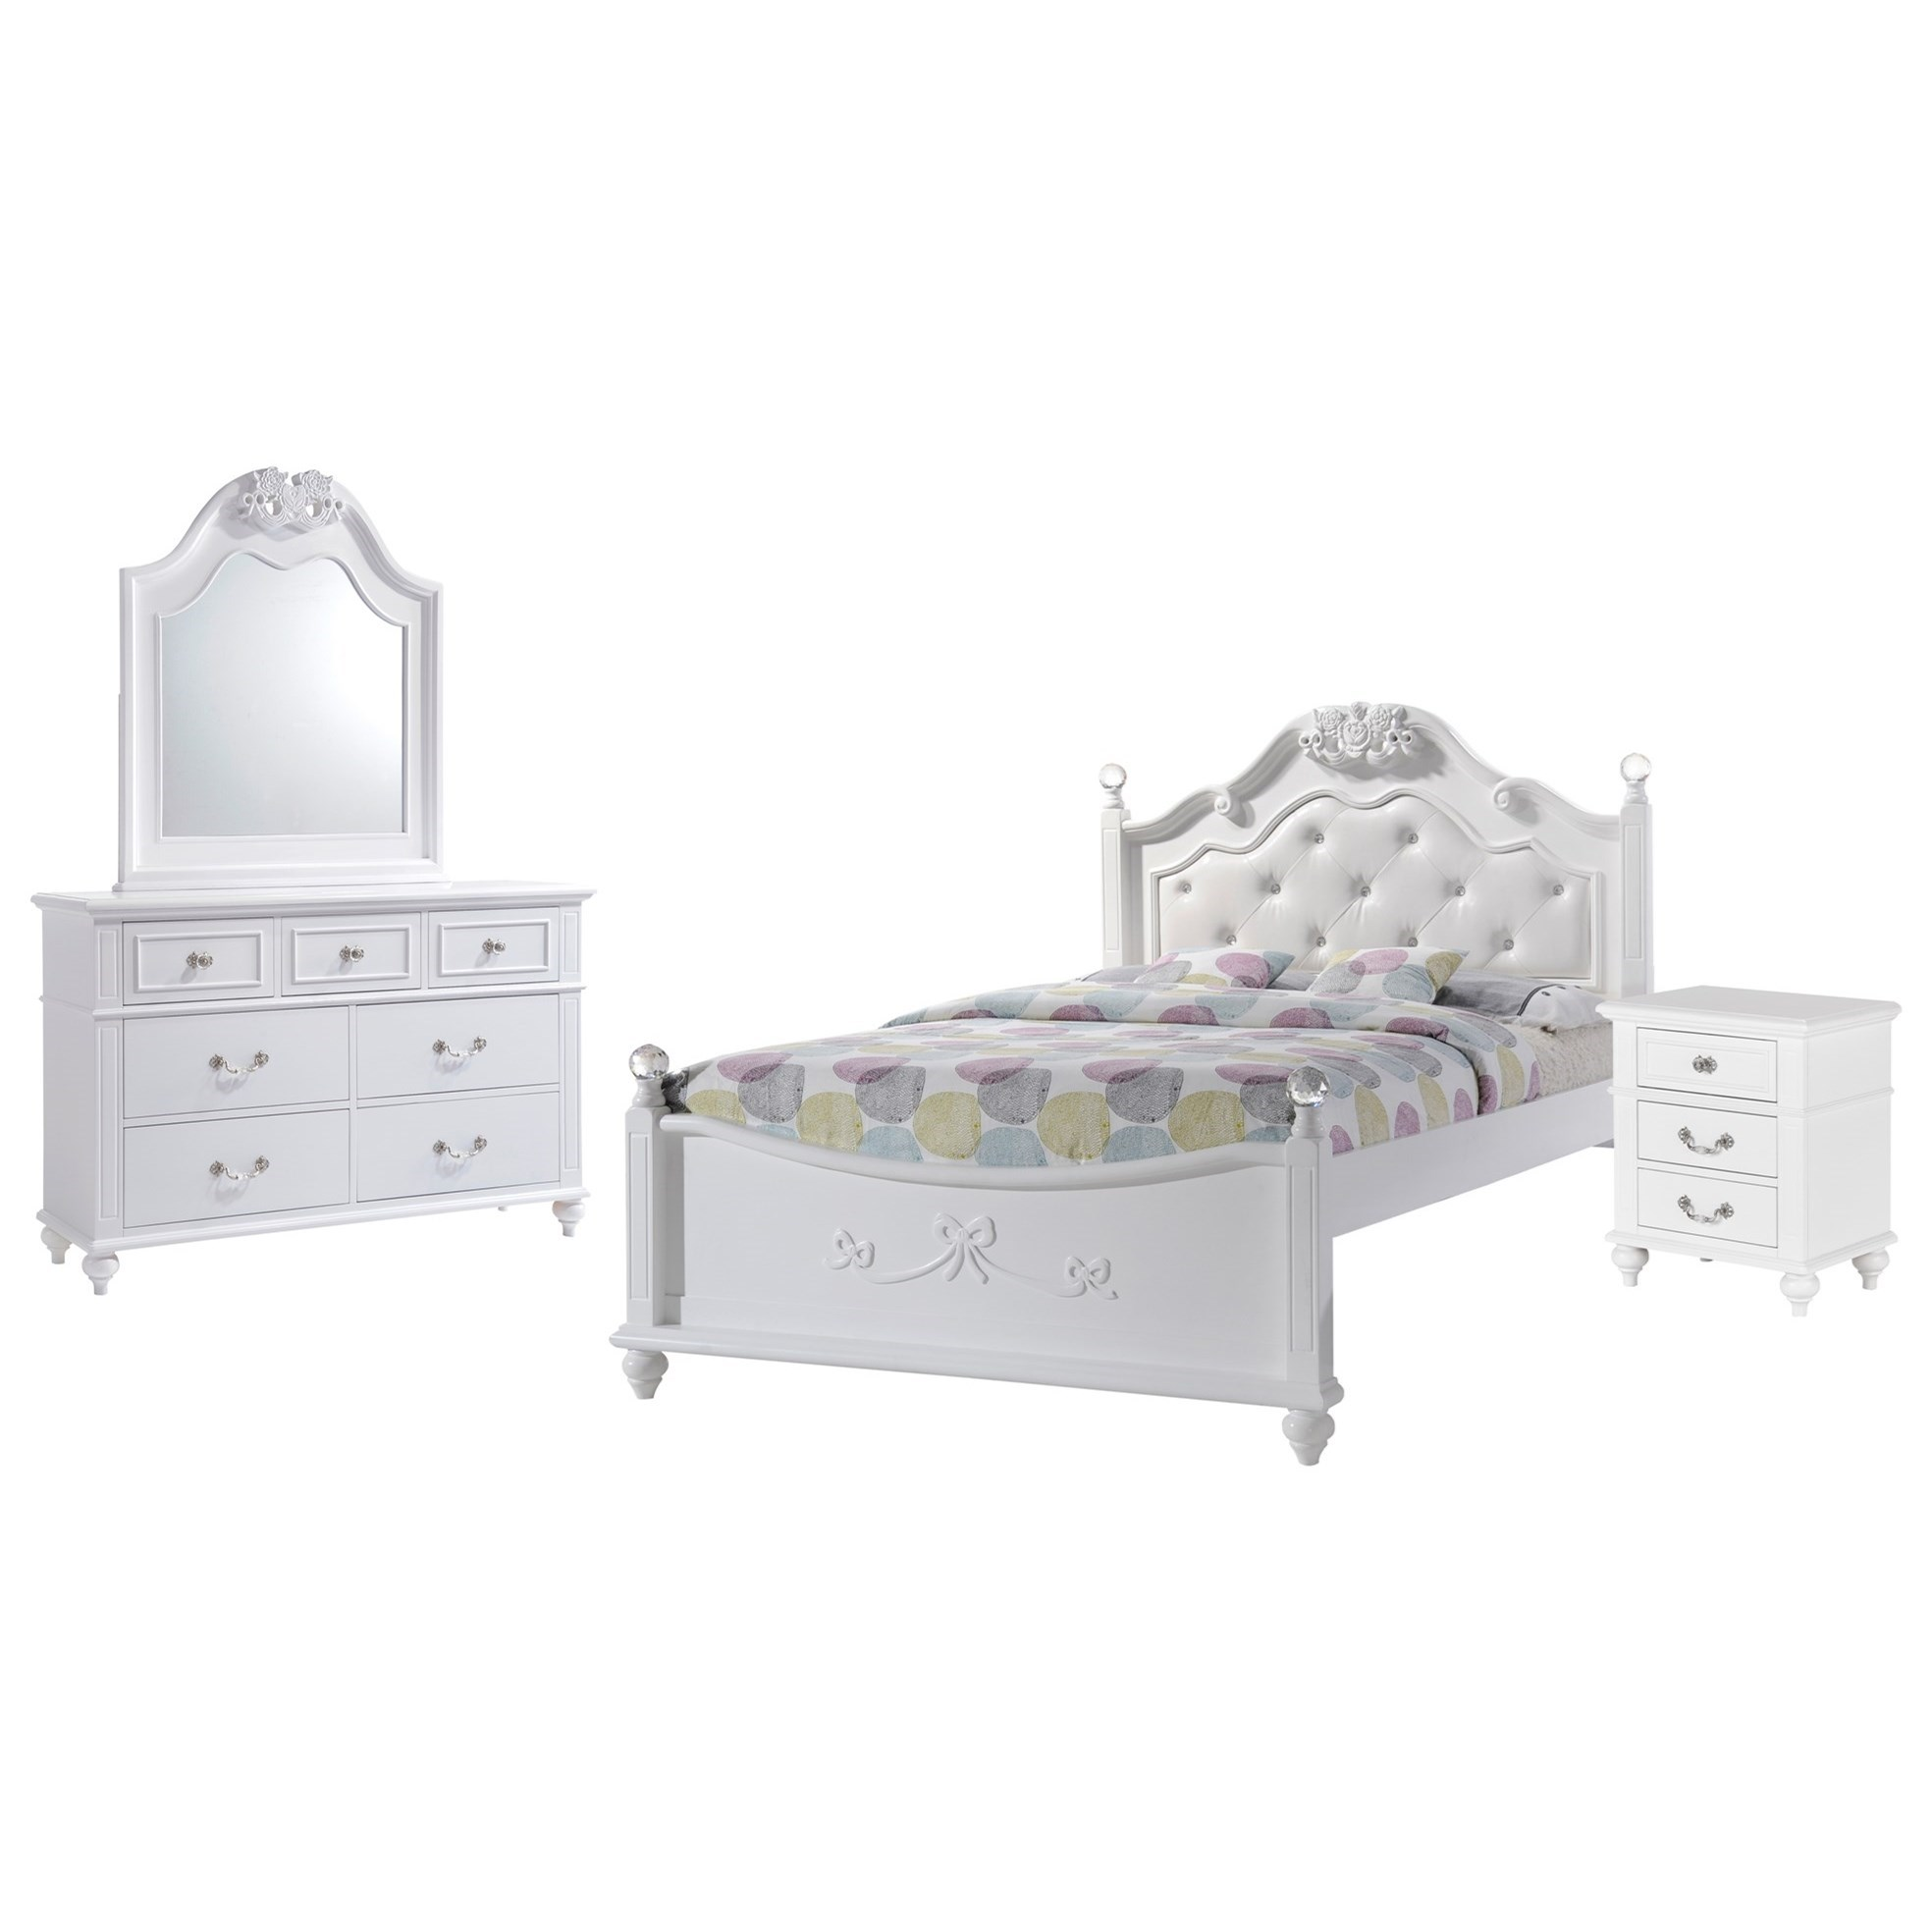 Alana Bedroom Set by Elements International at Beck's Furniture